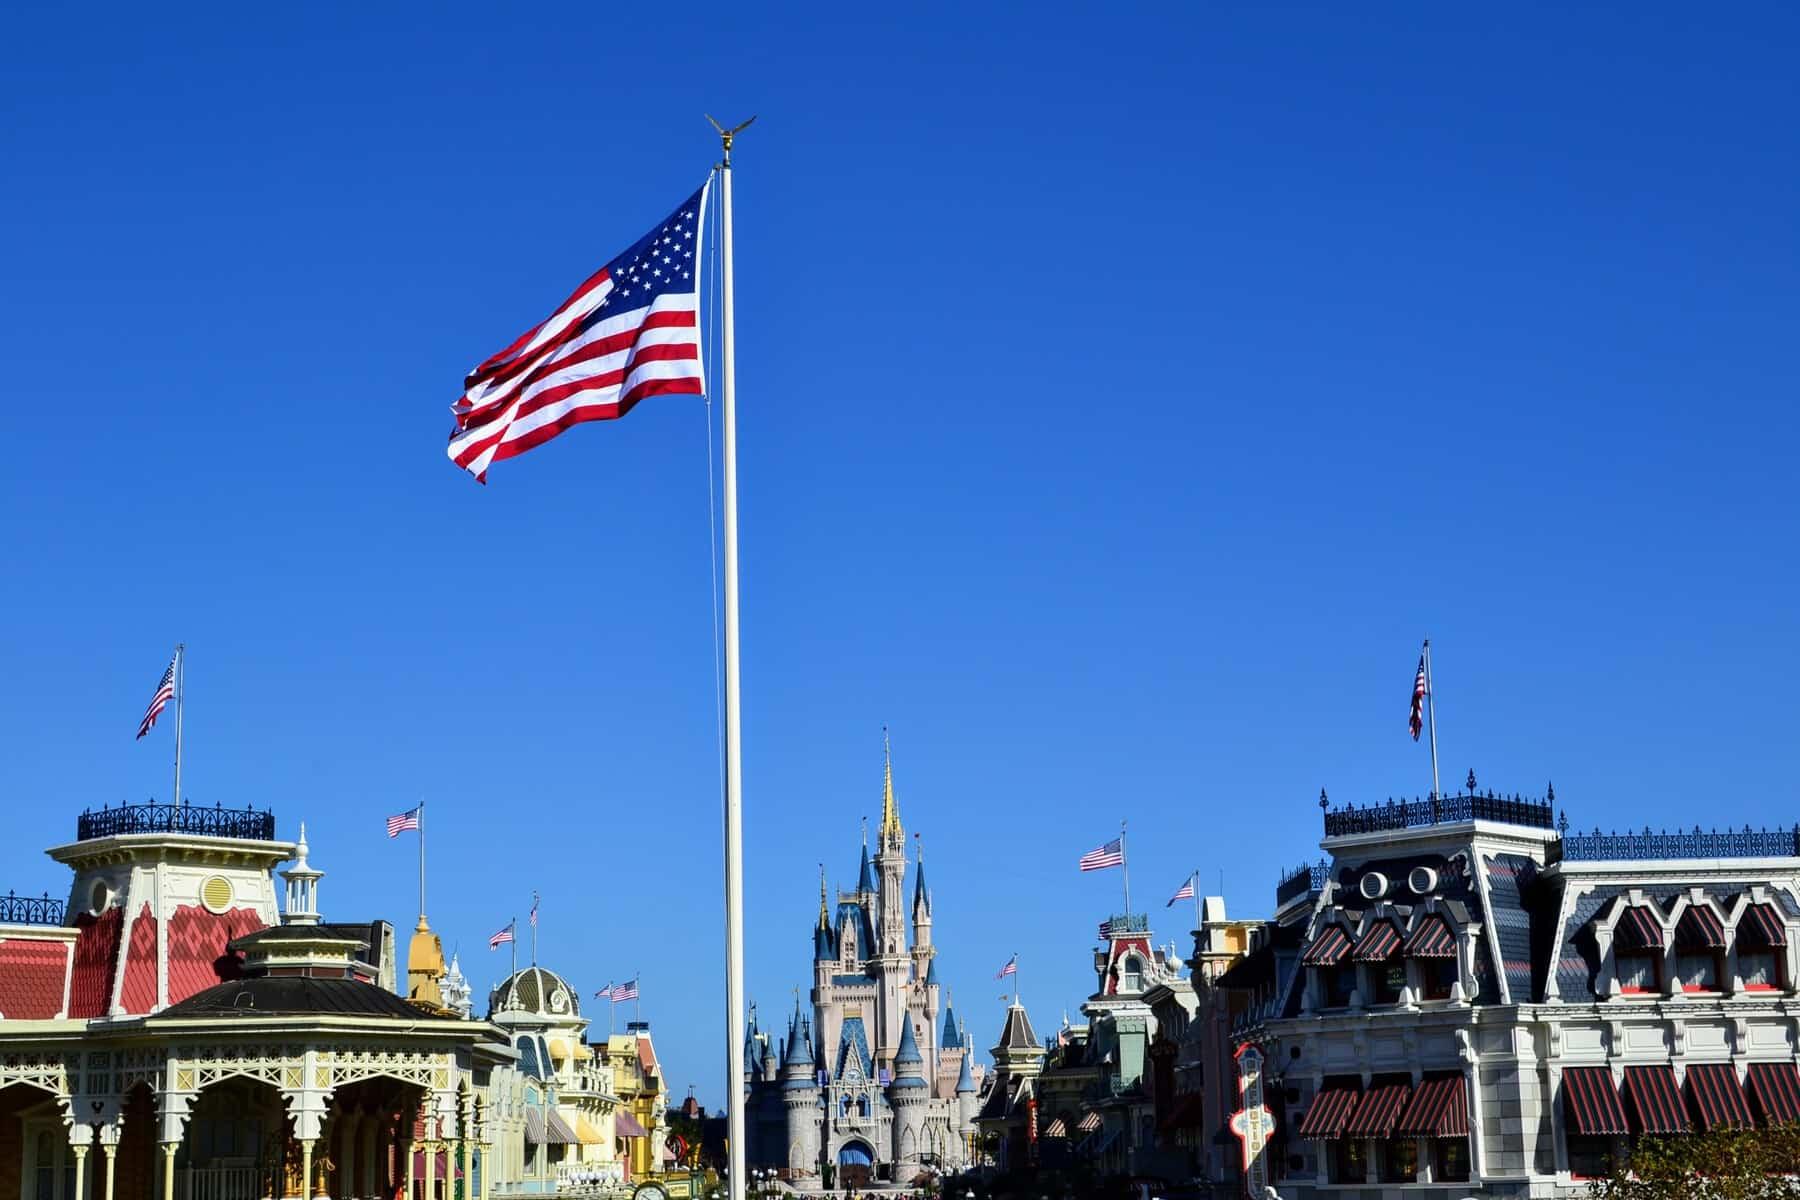 Flag on Main Street USA